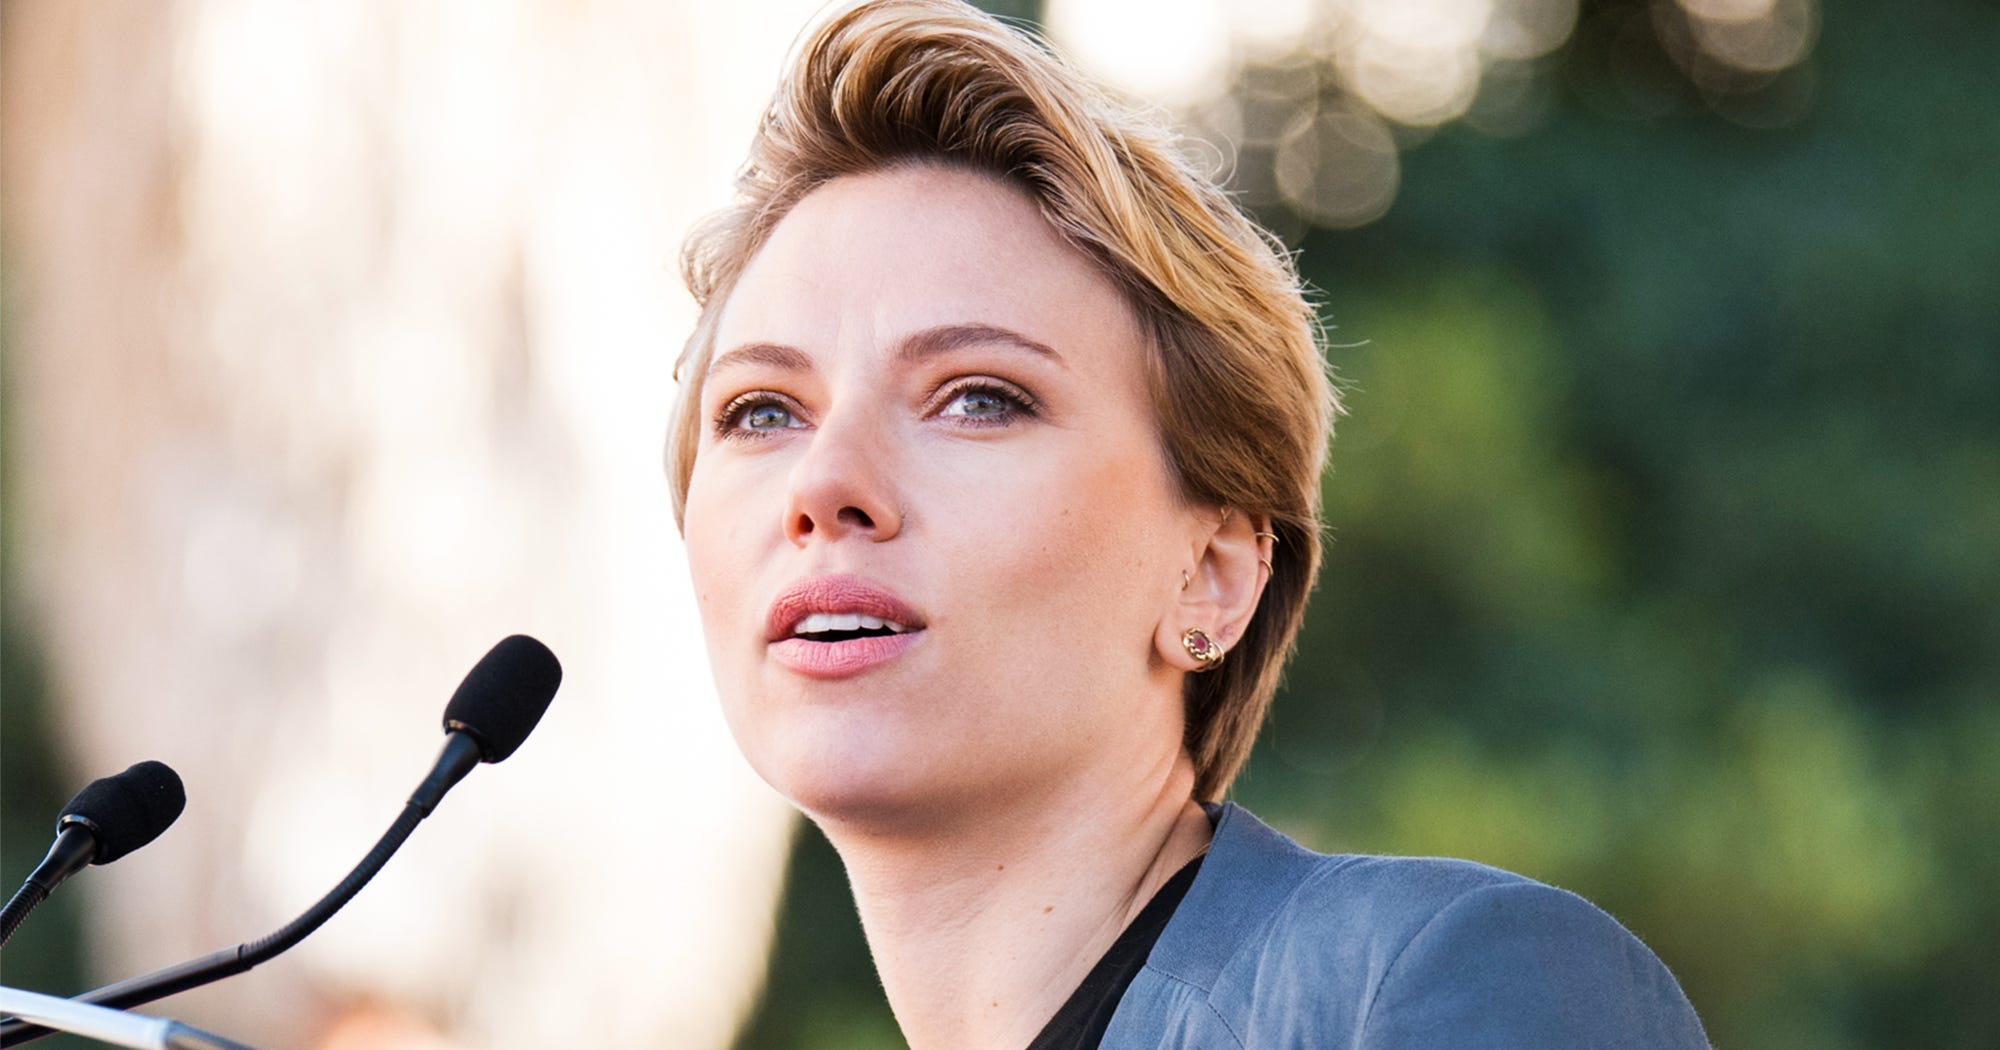 Scarlett Johansson Calls Out James Franco & Fake Allies At LA Women's March – Refinery29